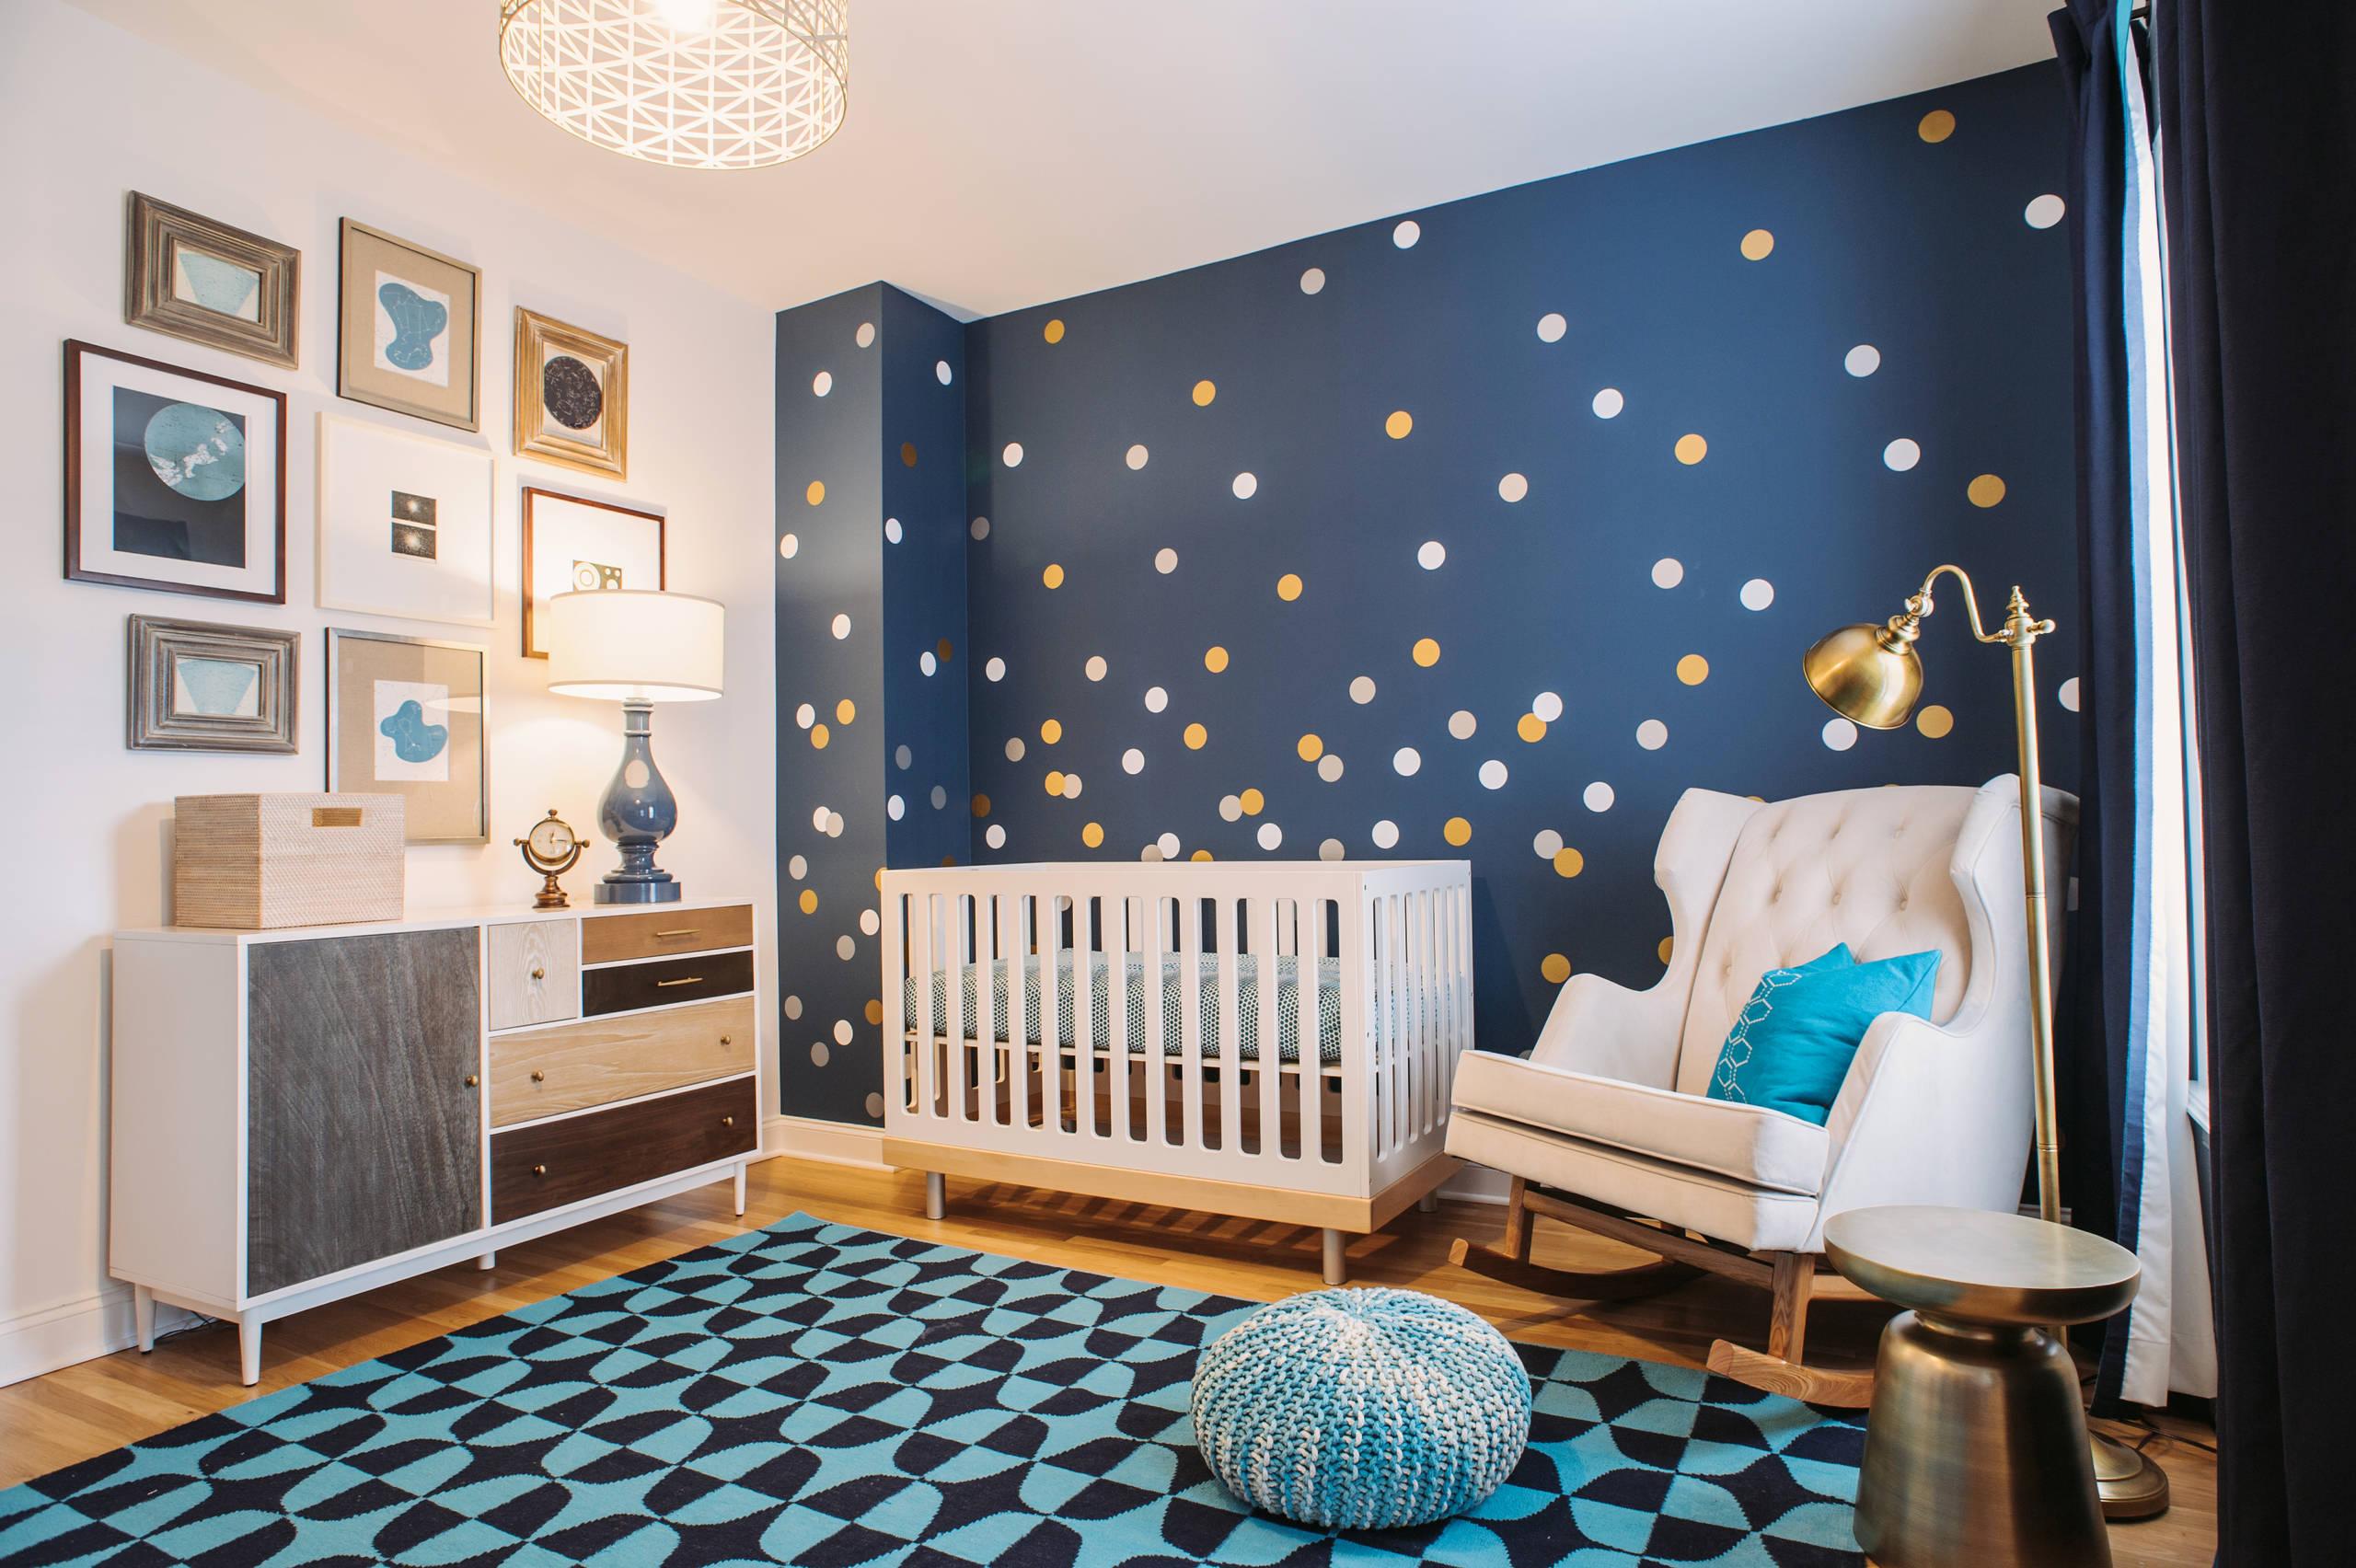 75 Beautiful Boy Nursery Pictures & Ideas | Houzz